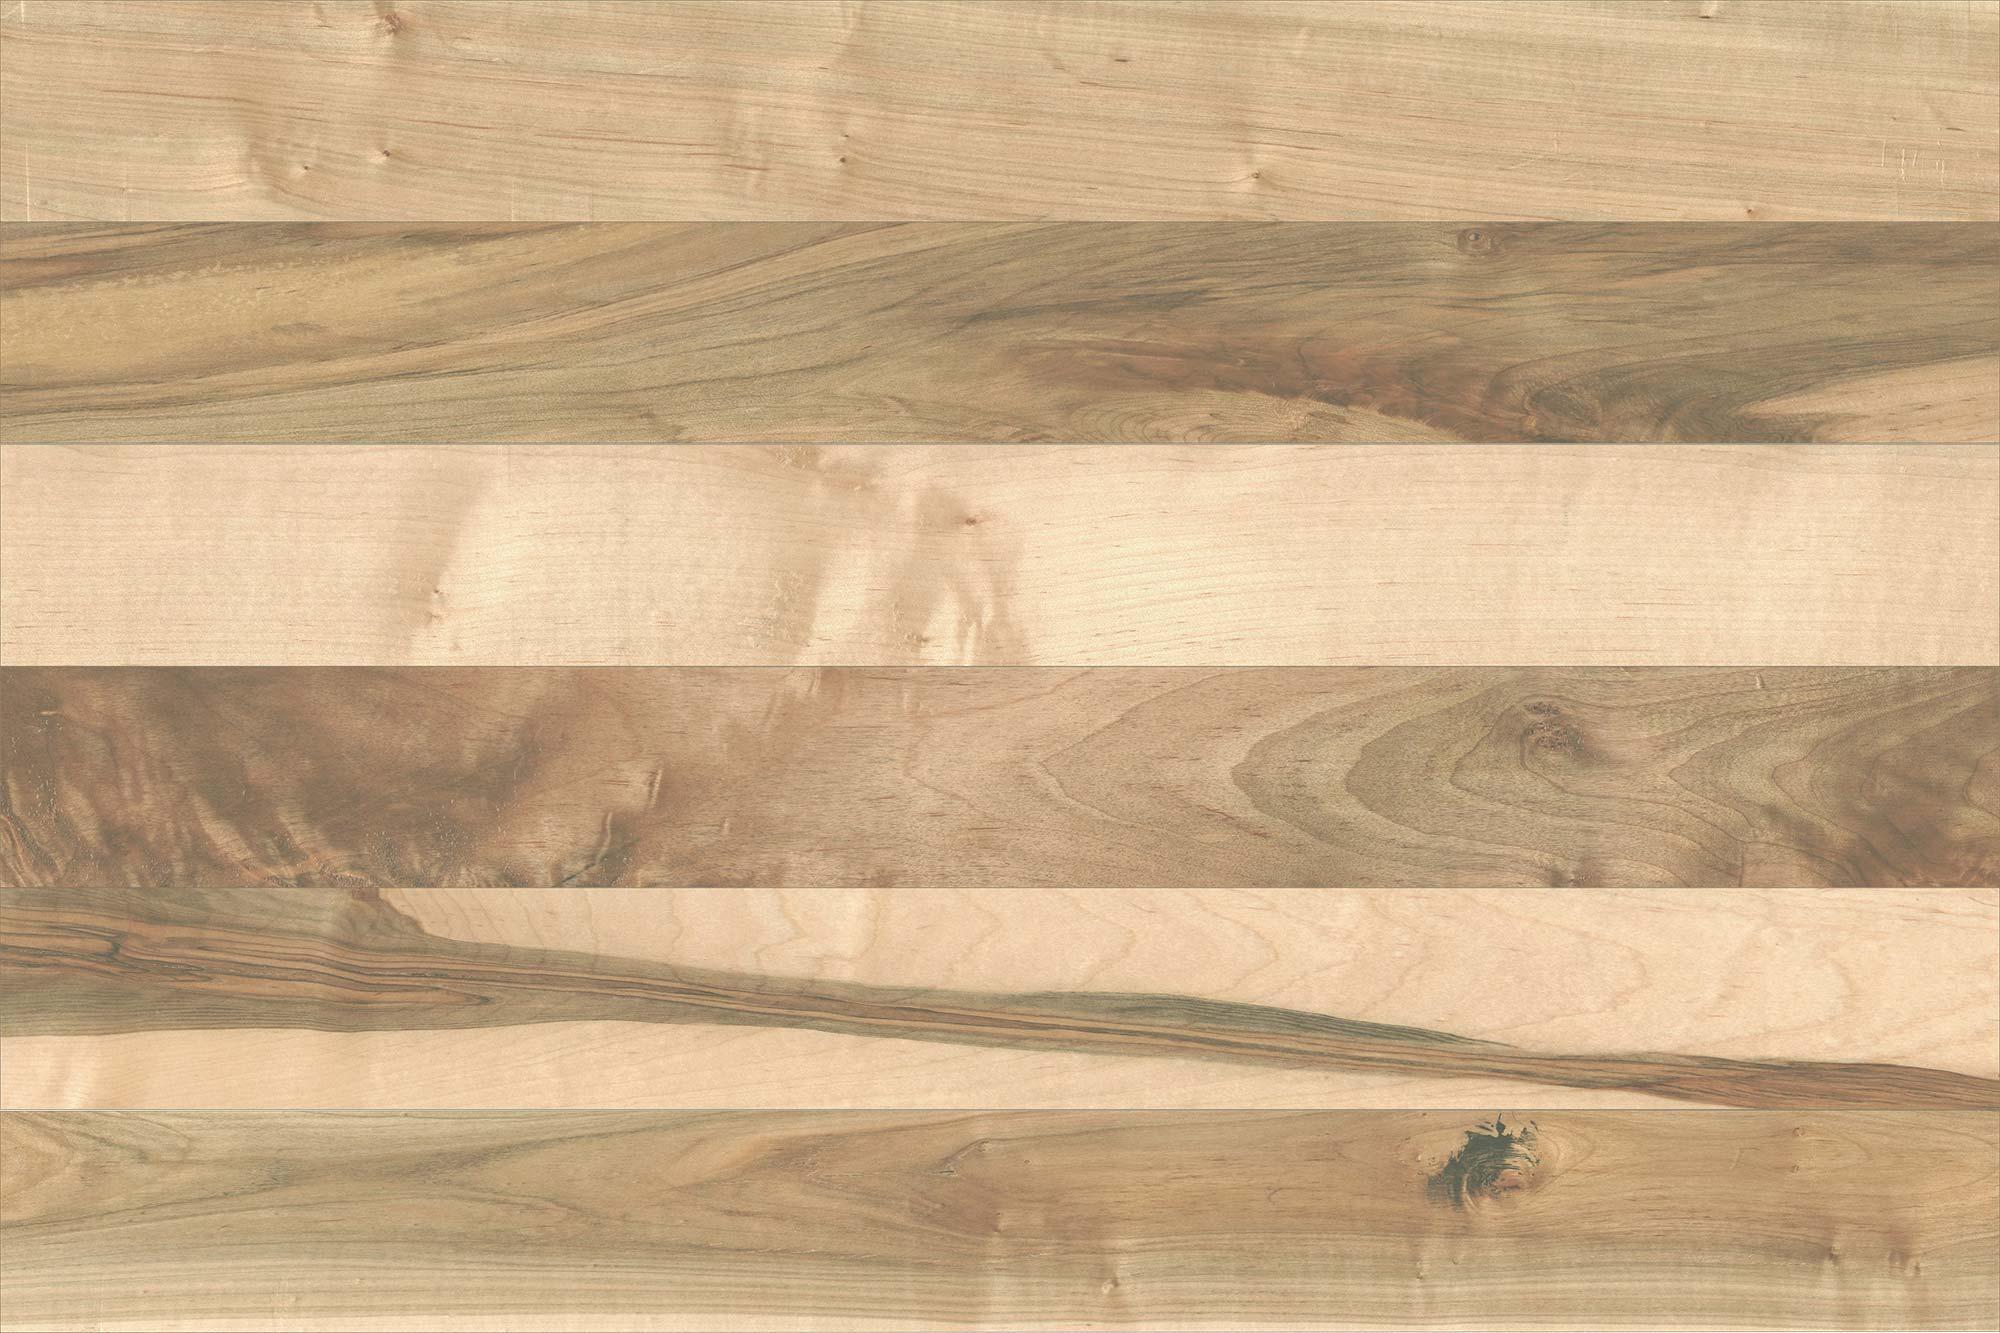 nail size for hardwood flooring of kingsmill natural maple 4 wide 3 4 solid hardwood flooring regarding natural maple m unat4 4 x 36 horizontal